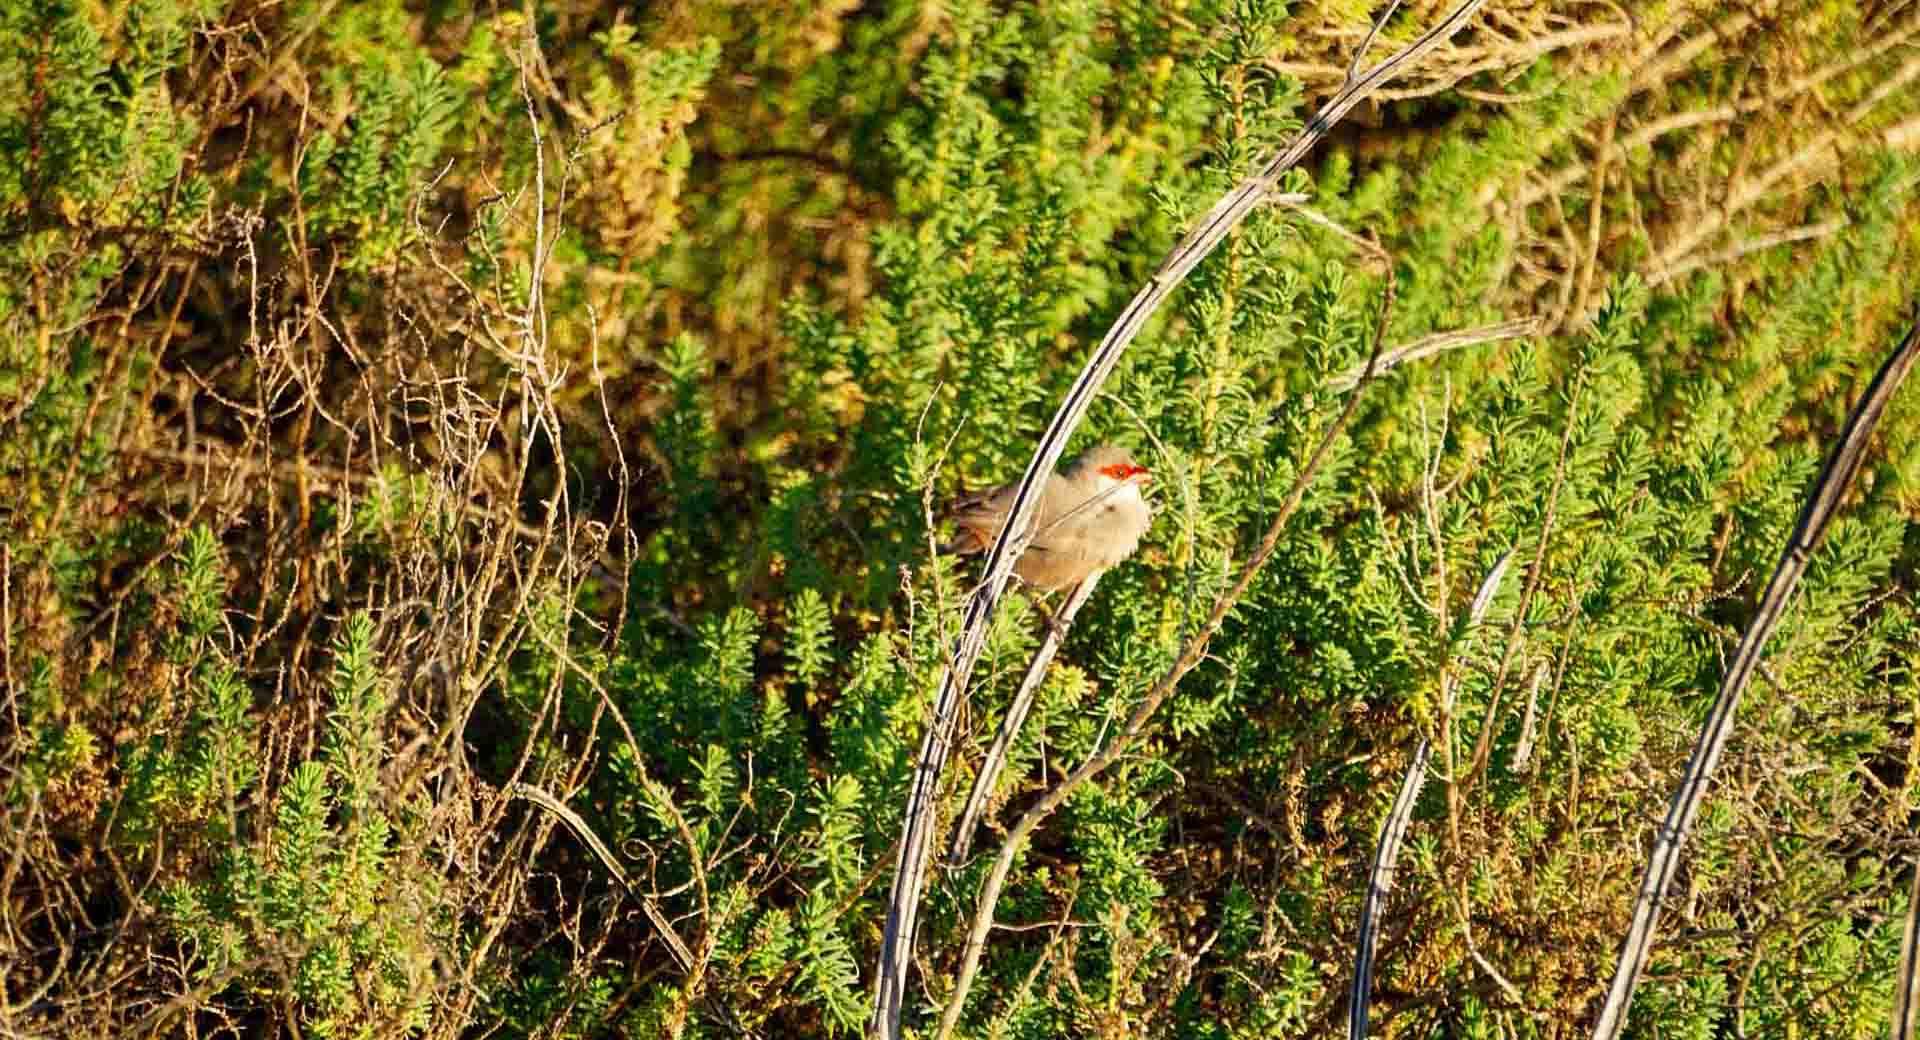 birdwatching-evoa-riserva-naturale-